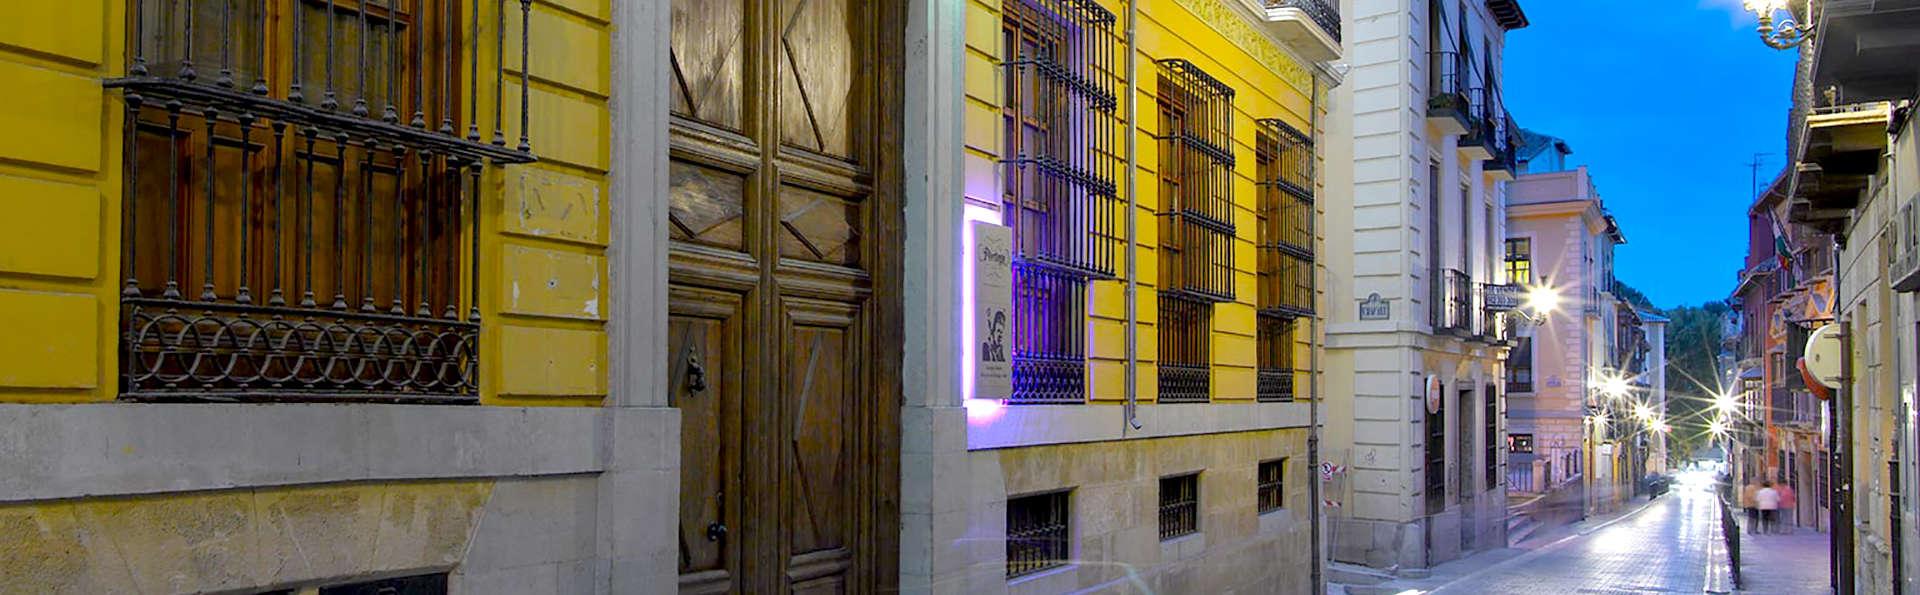 Marquis Hotels Portago - Edit_Front2.jpg